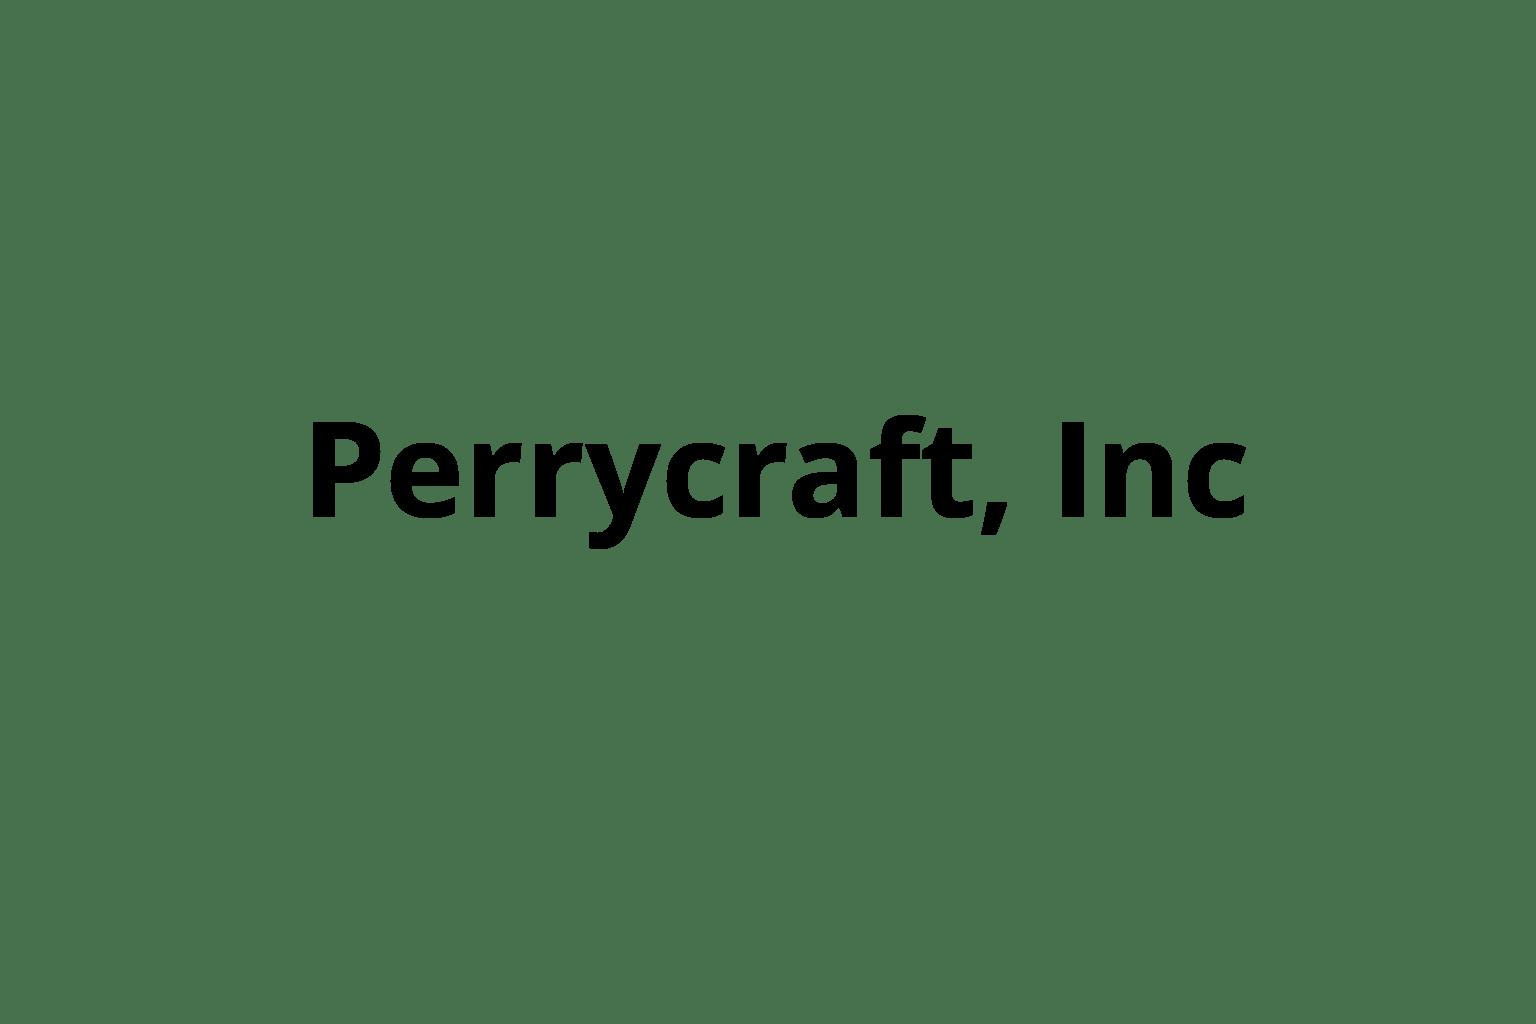 Perrycraft, Inc